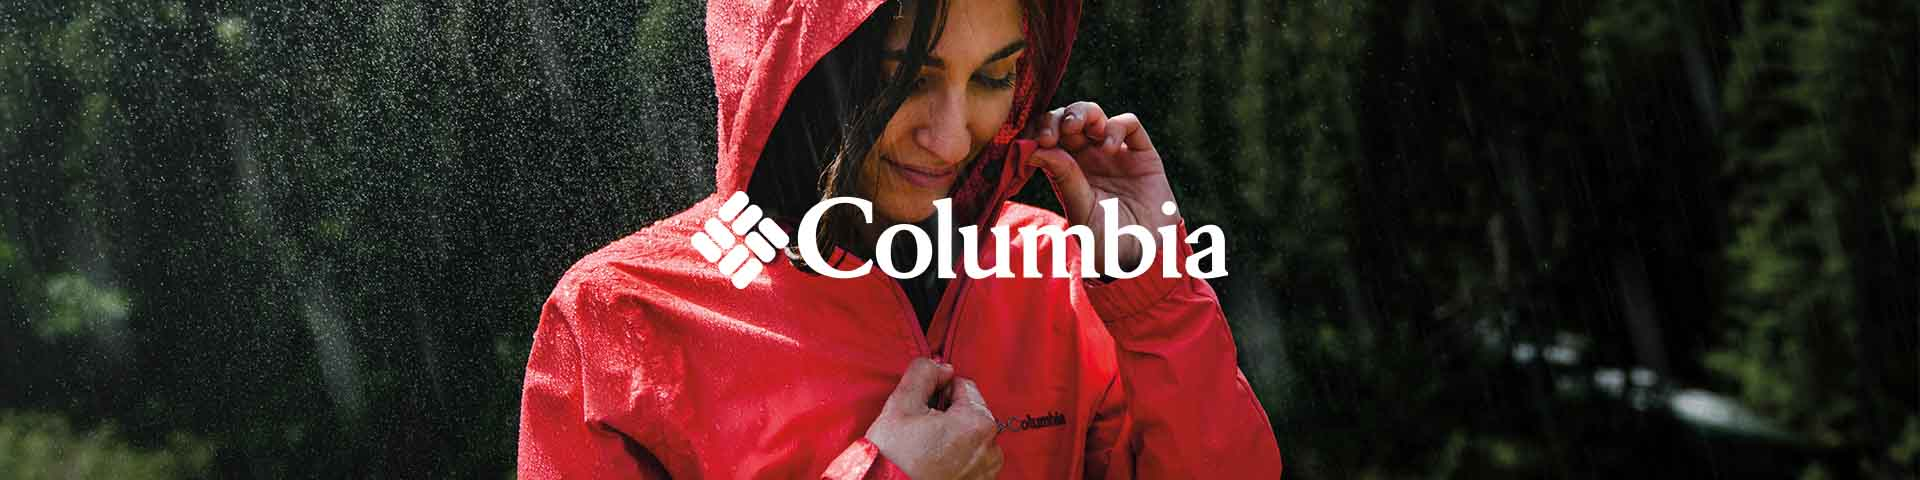 Columbia OnlineAktuelle Top Marken Damenschuhe Von Kollektionen wXPO8n0k